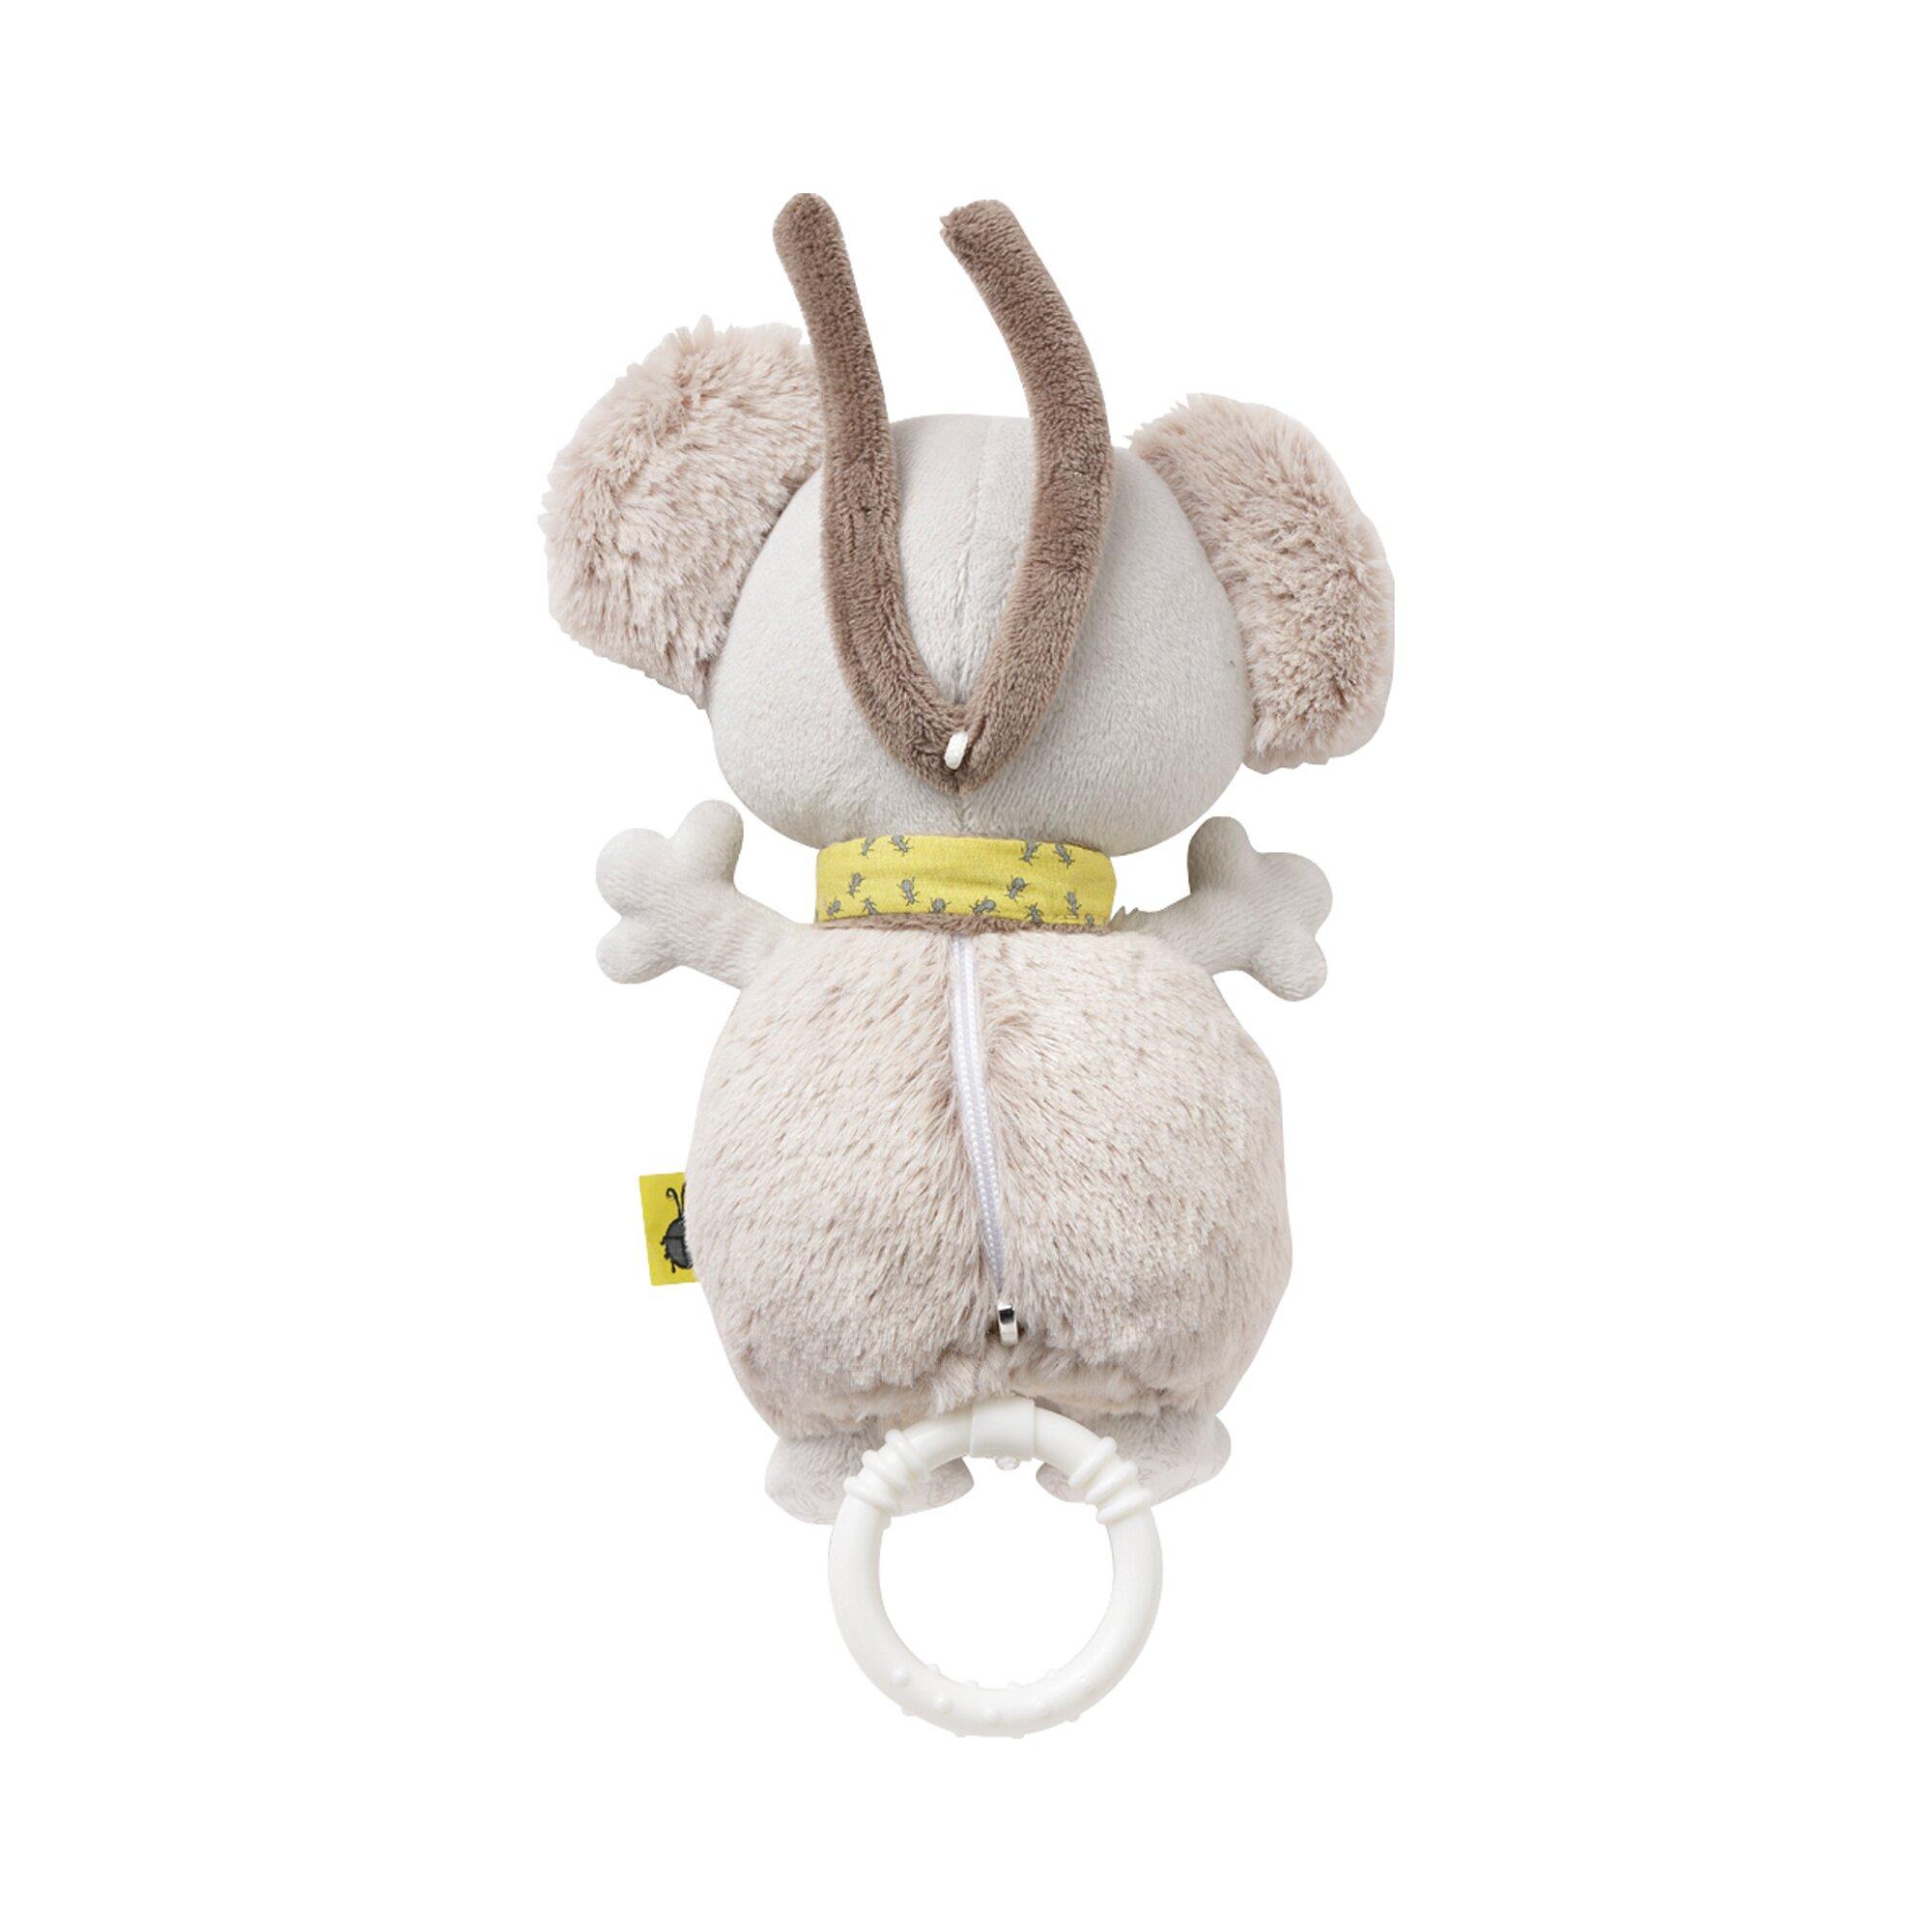 fehn-spieluhr-koala-australia-19cm